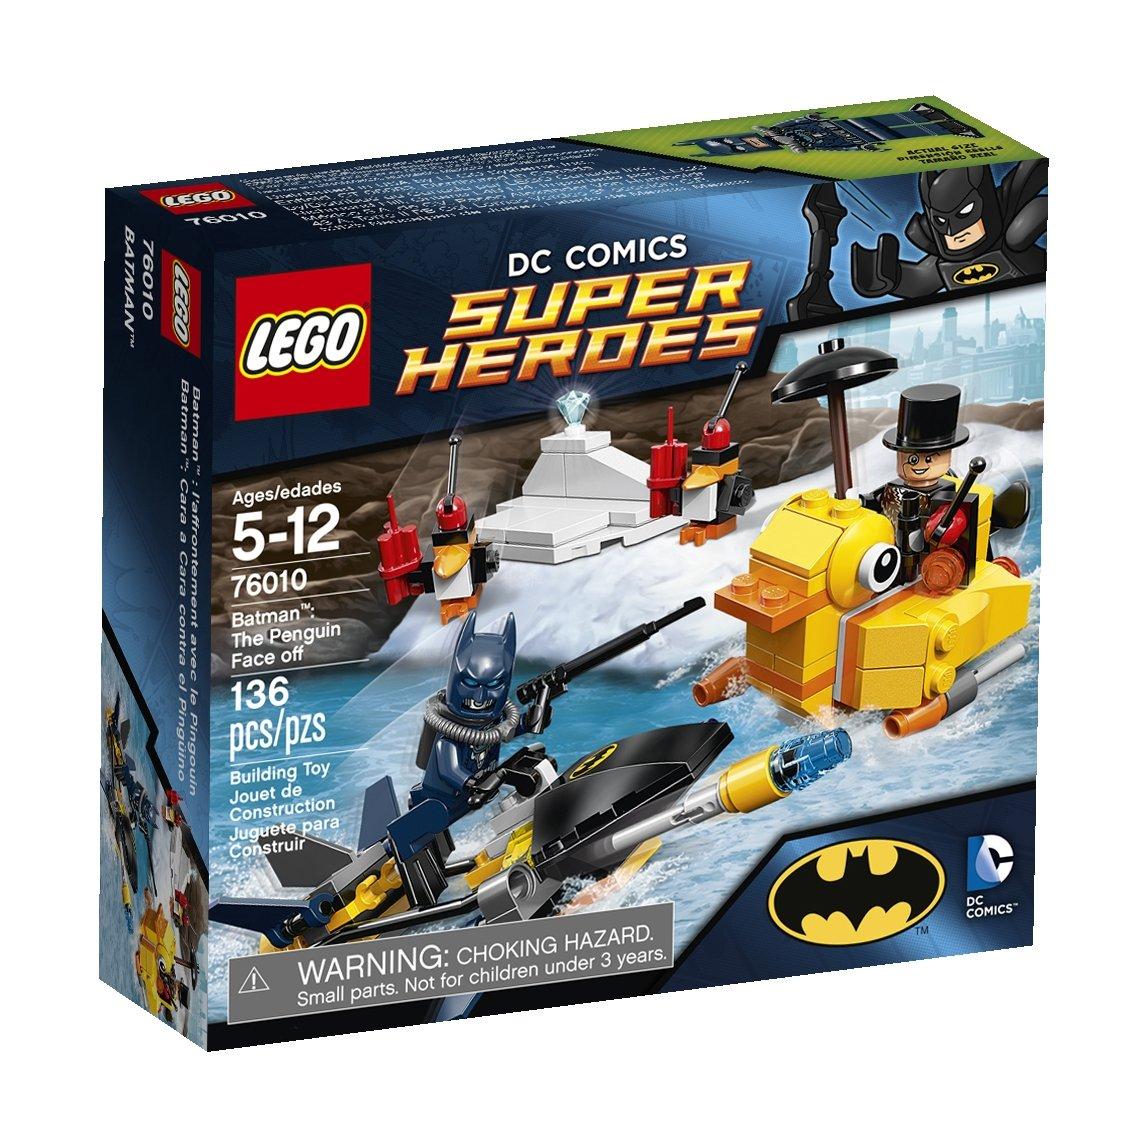 Top 23 Best Batman Toys 2020: LEGO, Mask, Costume for Kids 1